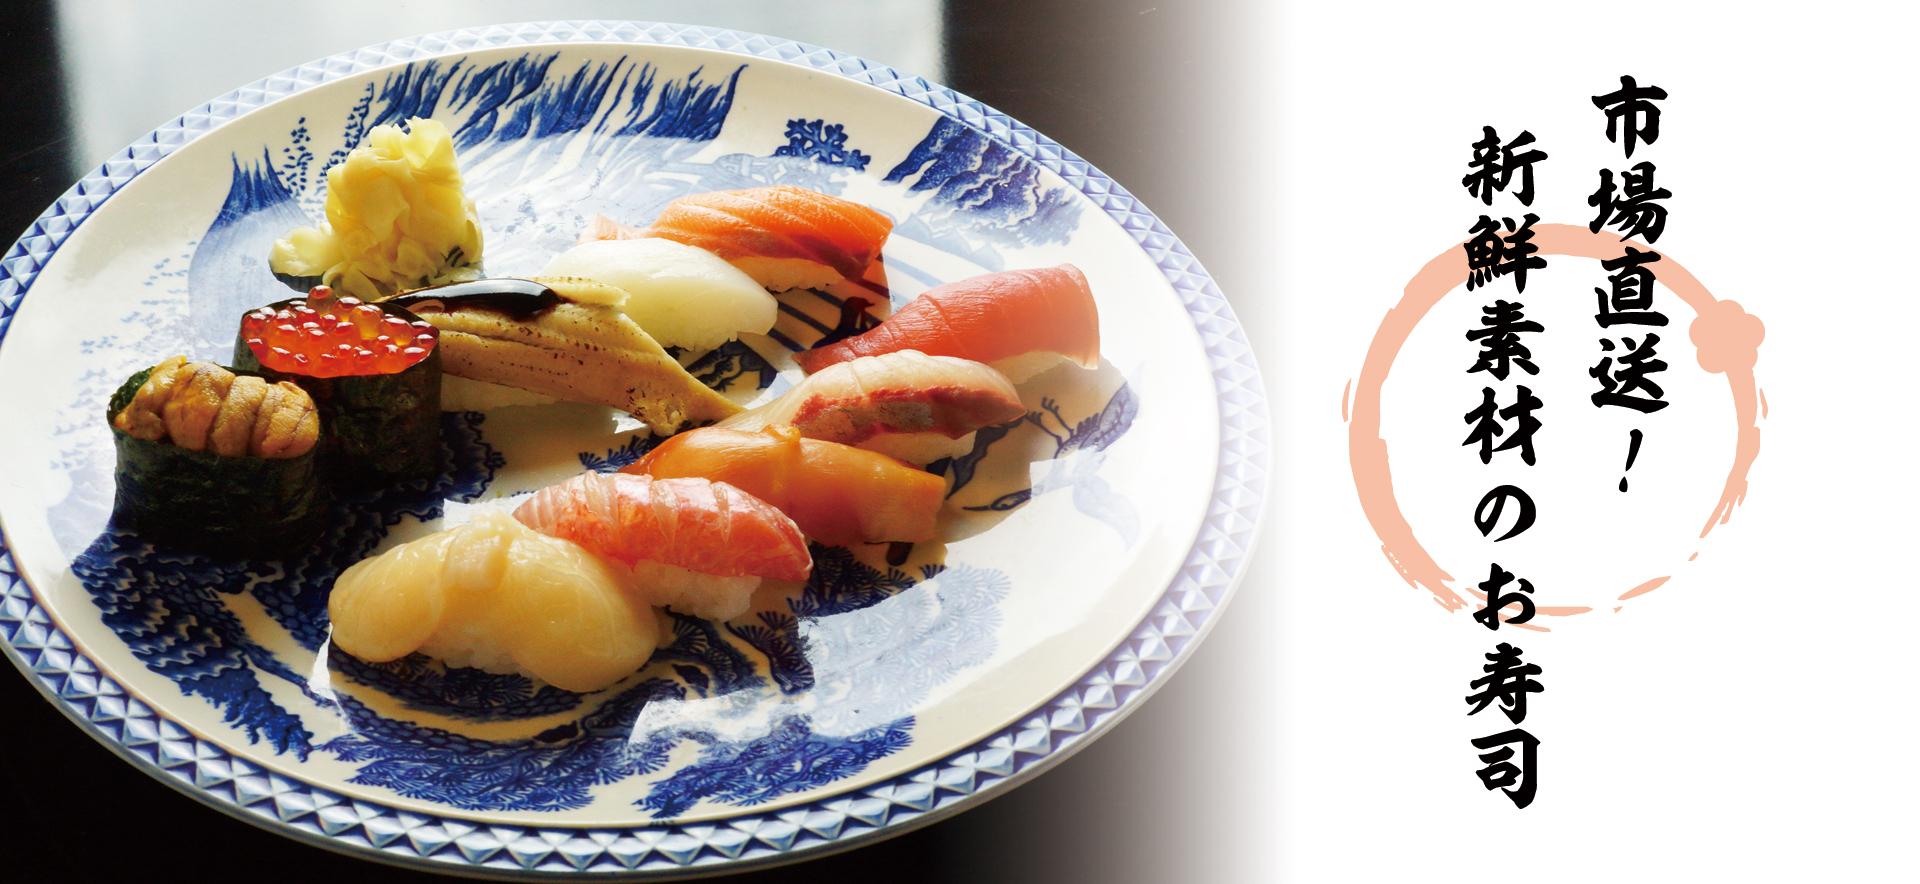 momomaru-sushi